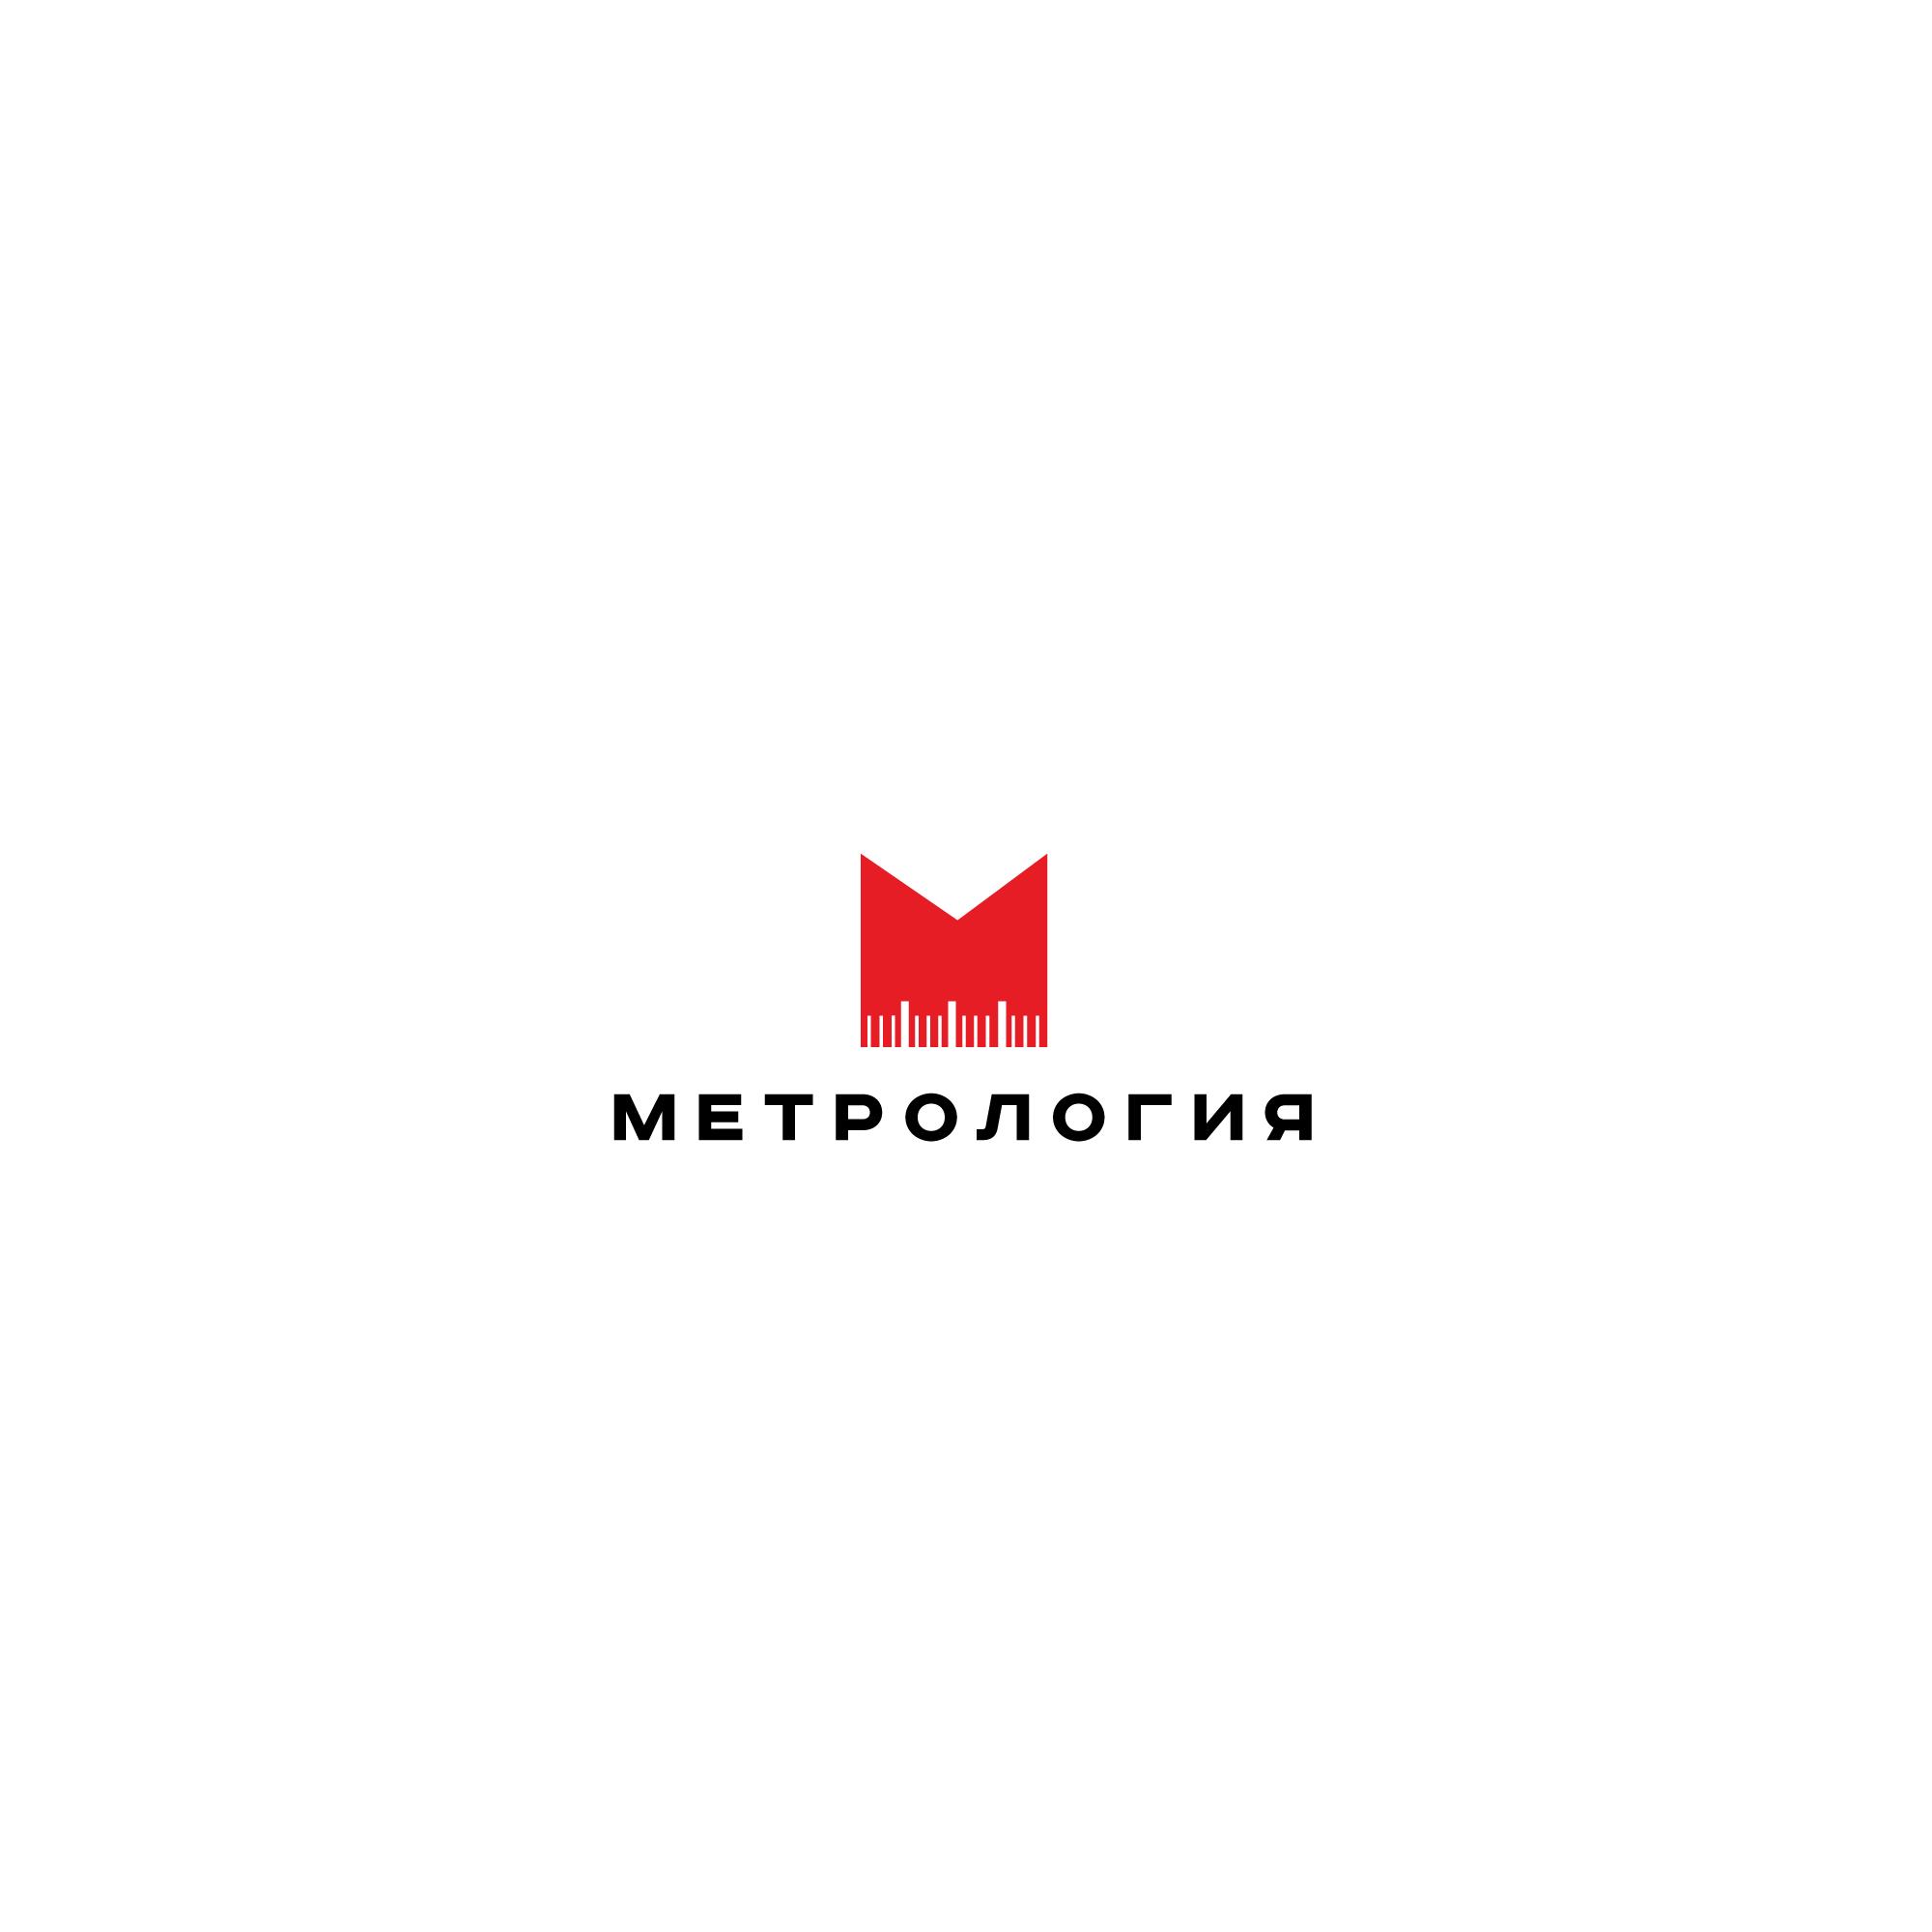 Разработать логотип, визитку, фирменный бланк. фото f_53958f48f29e8fc1.jpg